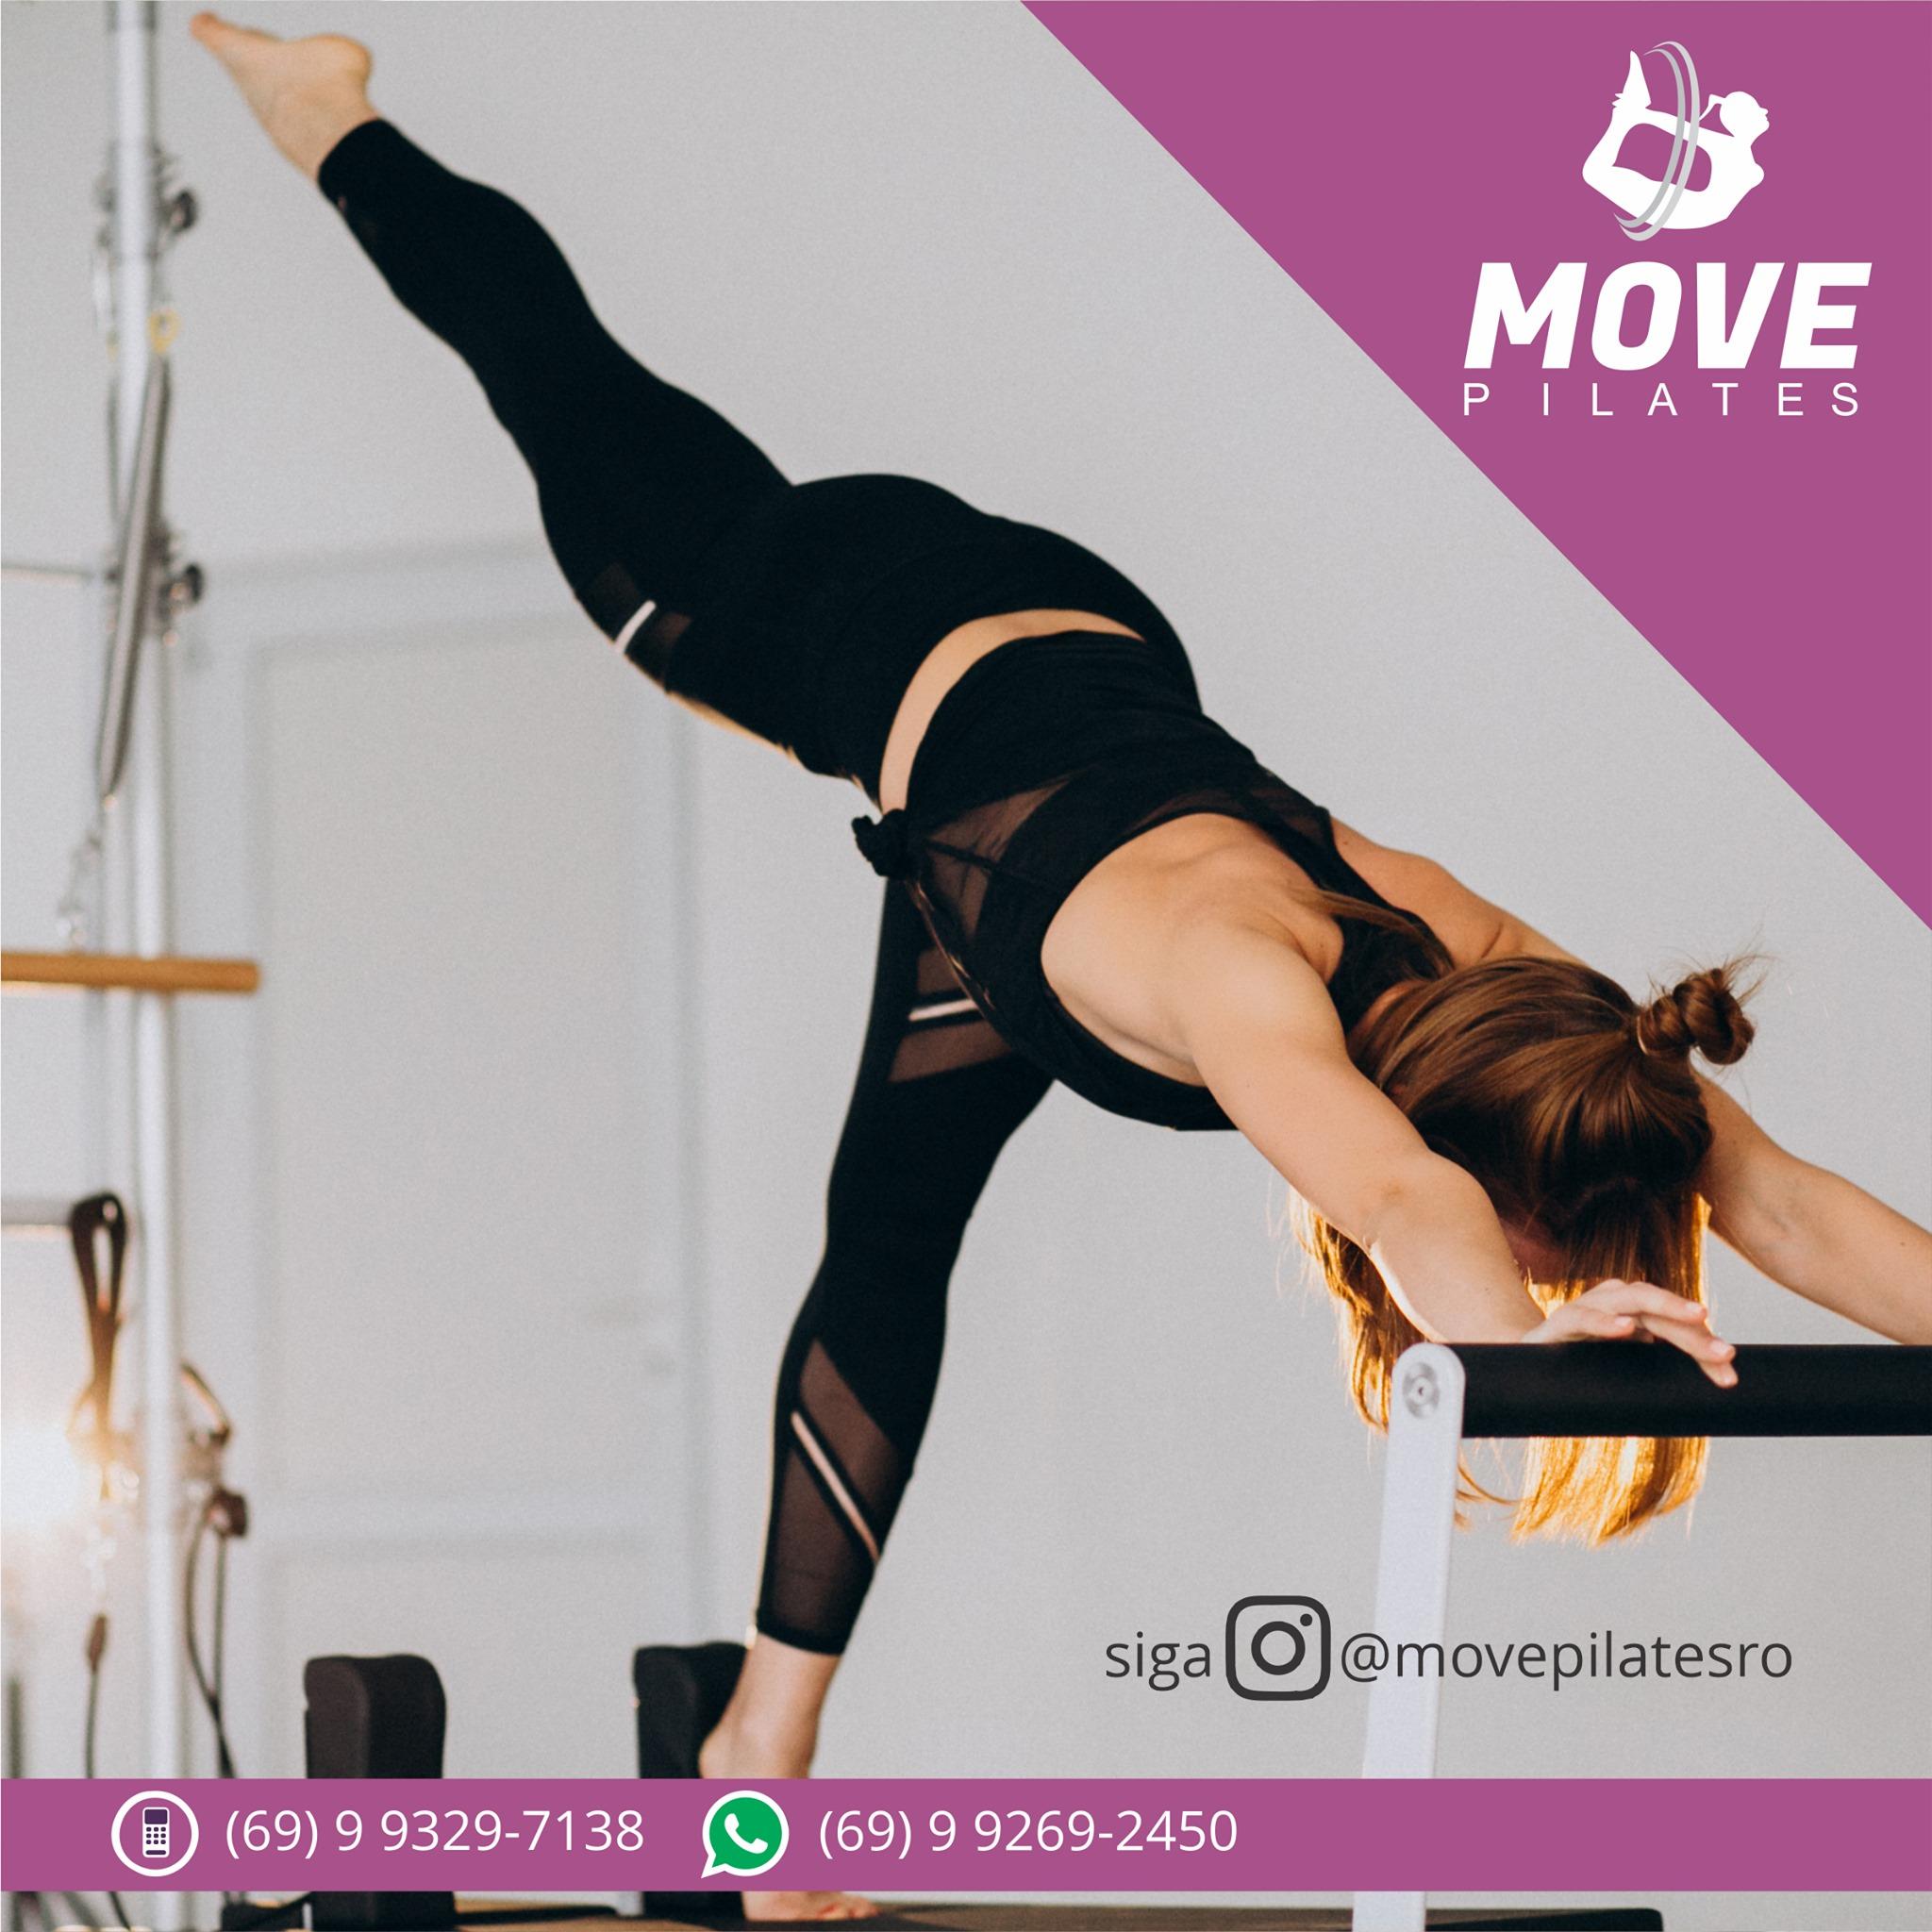 Move Pilates